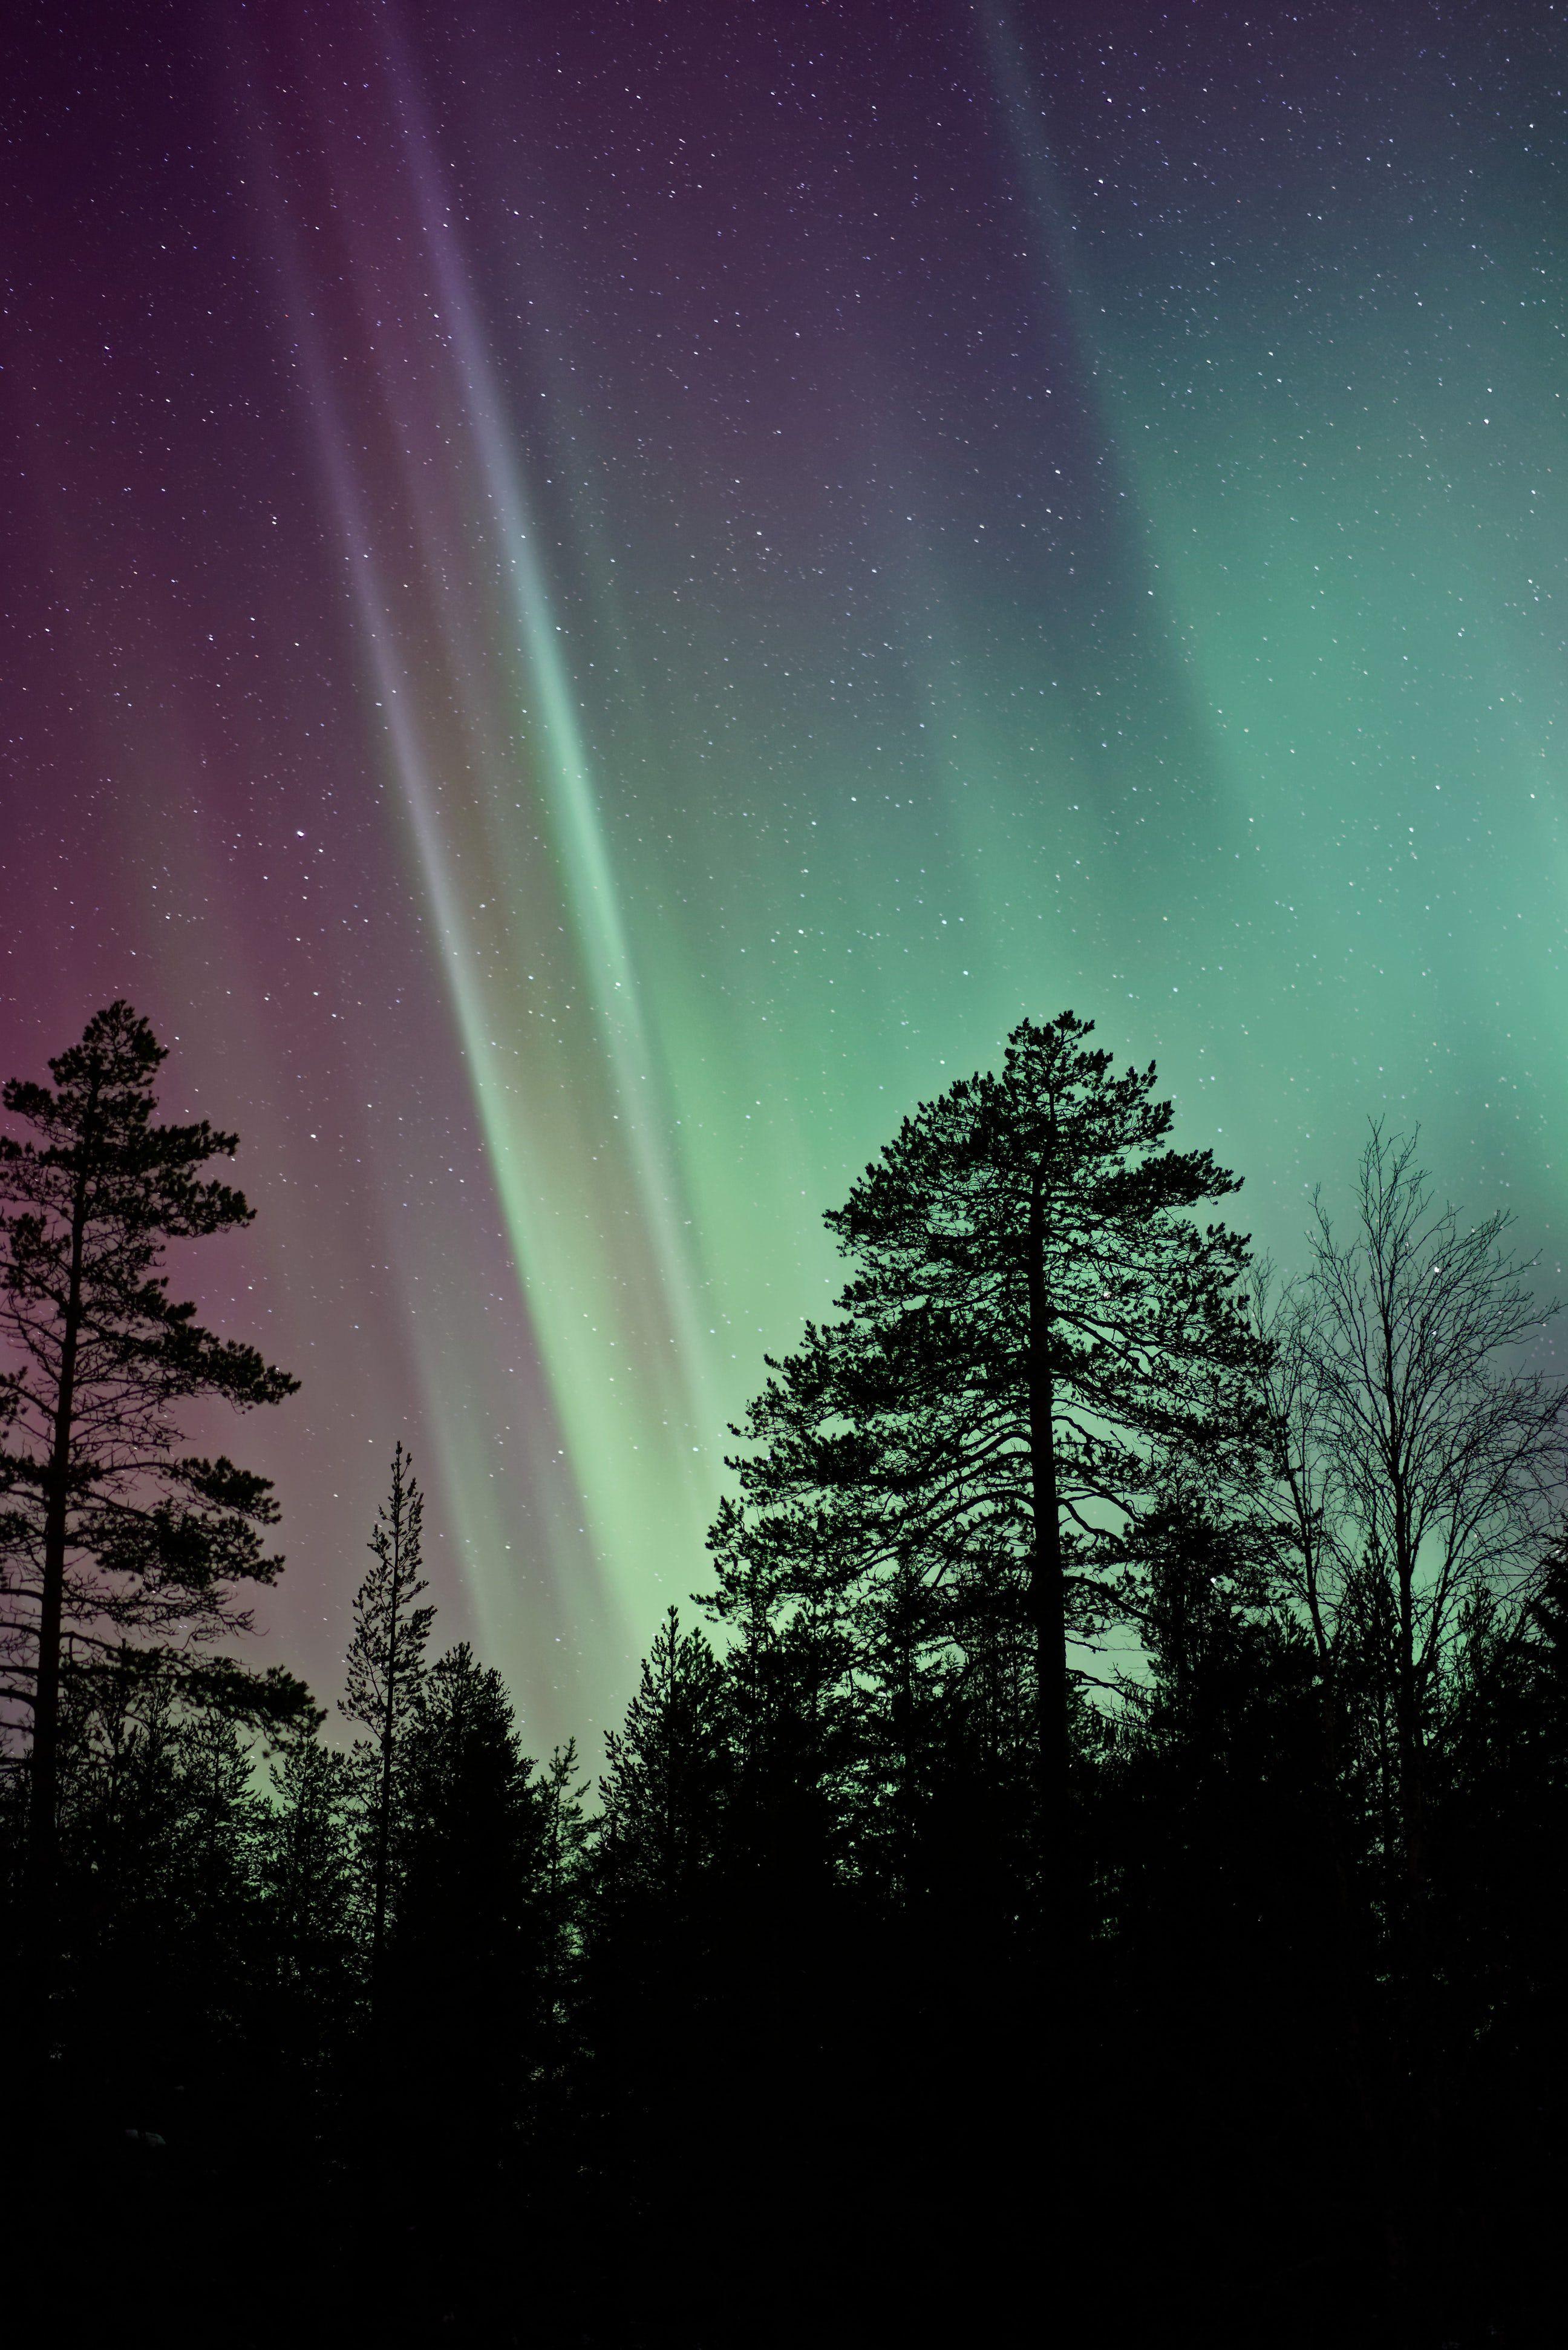 Download iPhone Wallpapers Unsplash Northern lights